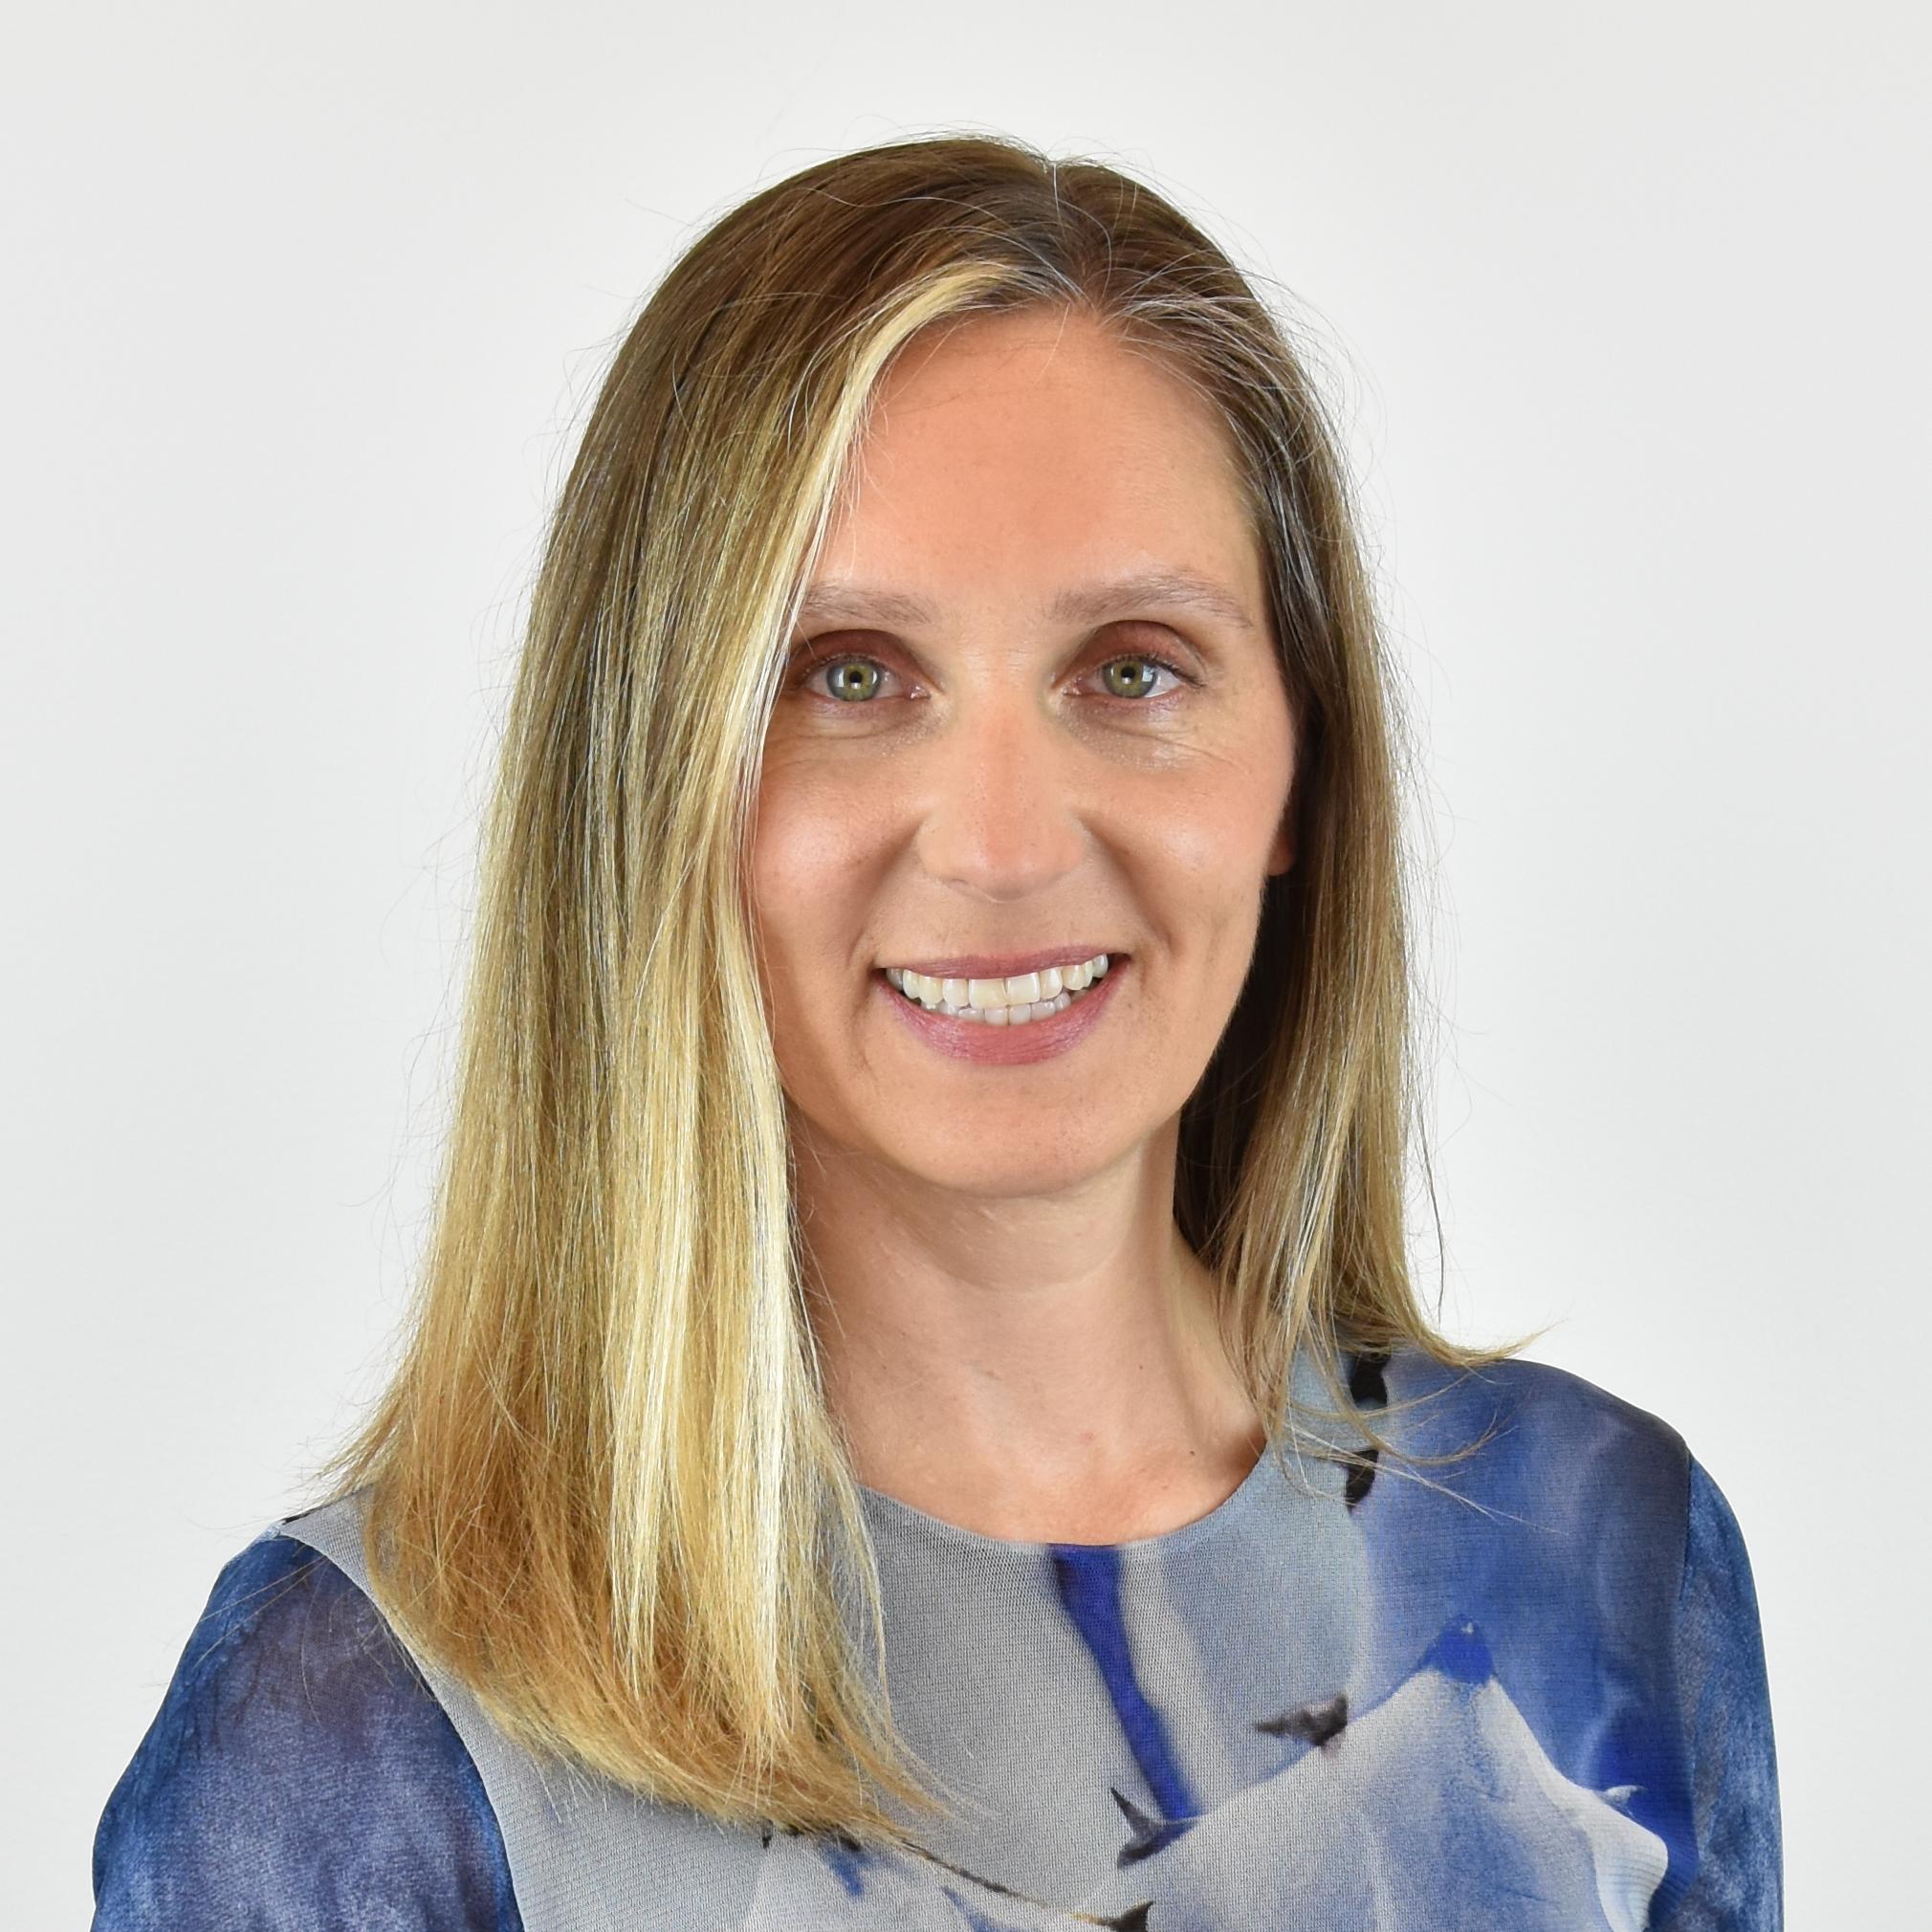 Photo of Ania Mitros, Ph.D.